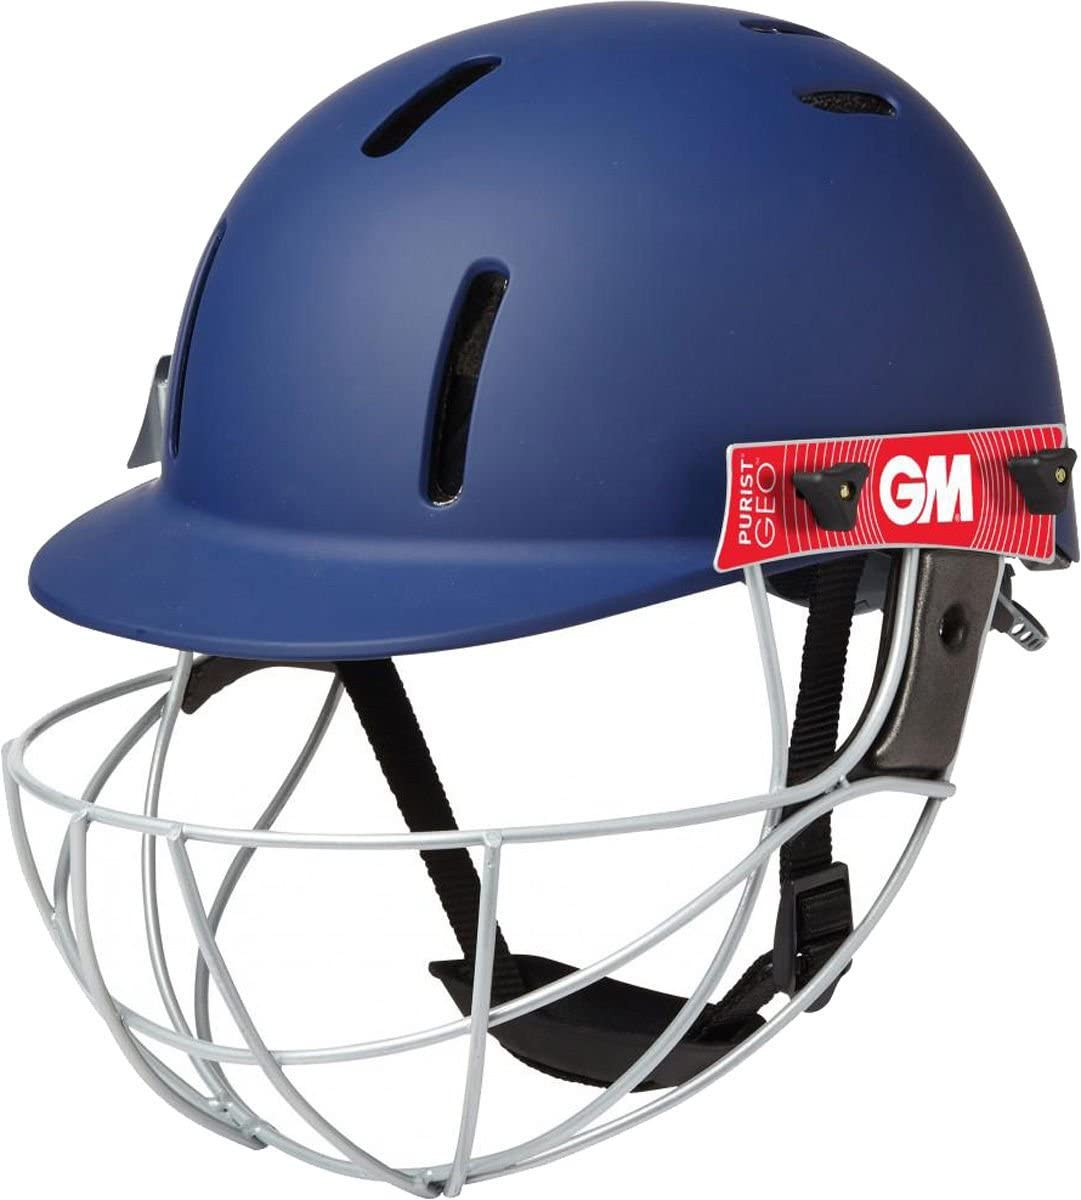 GM Cricket Helmet Gunn /& Moore Purist Geo Junior Kids